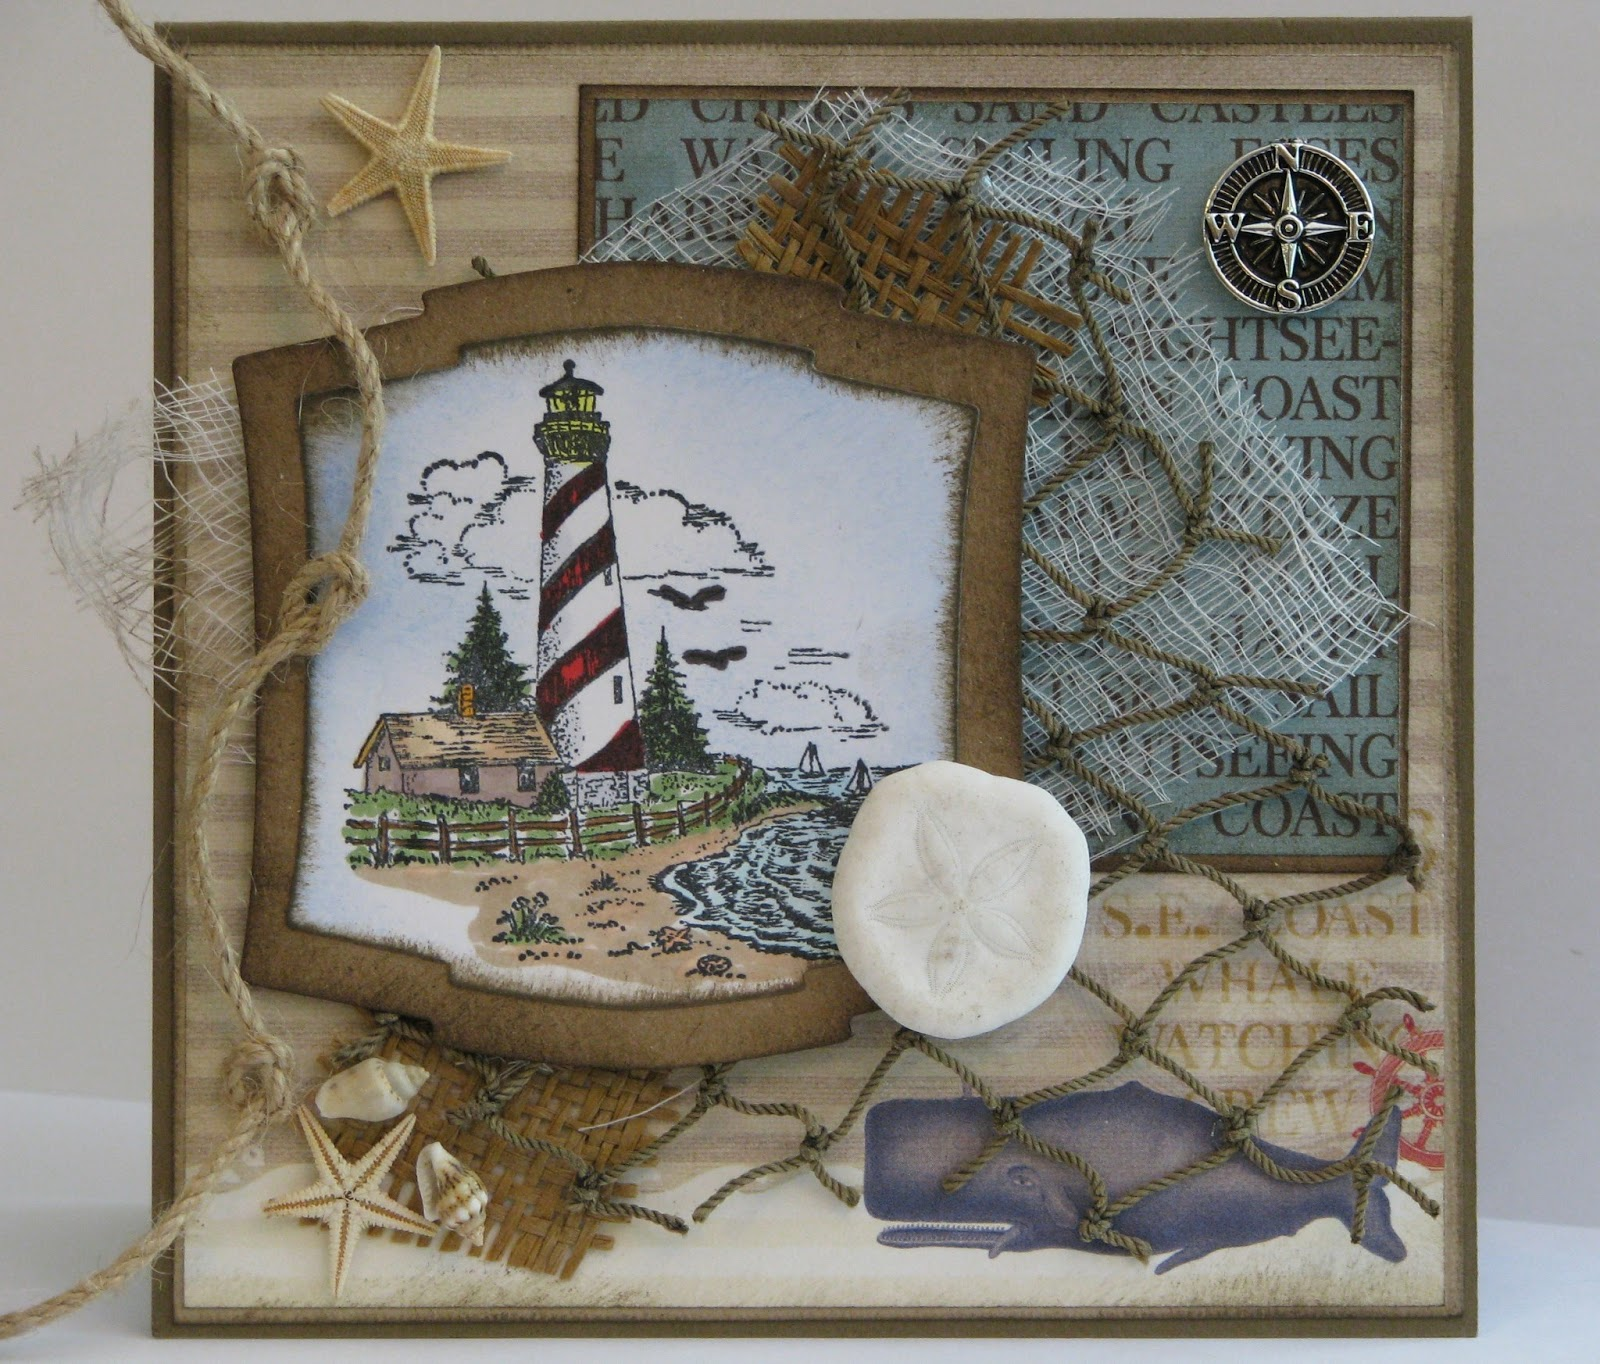 Картинках, открытка мужчине морская тематика